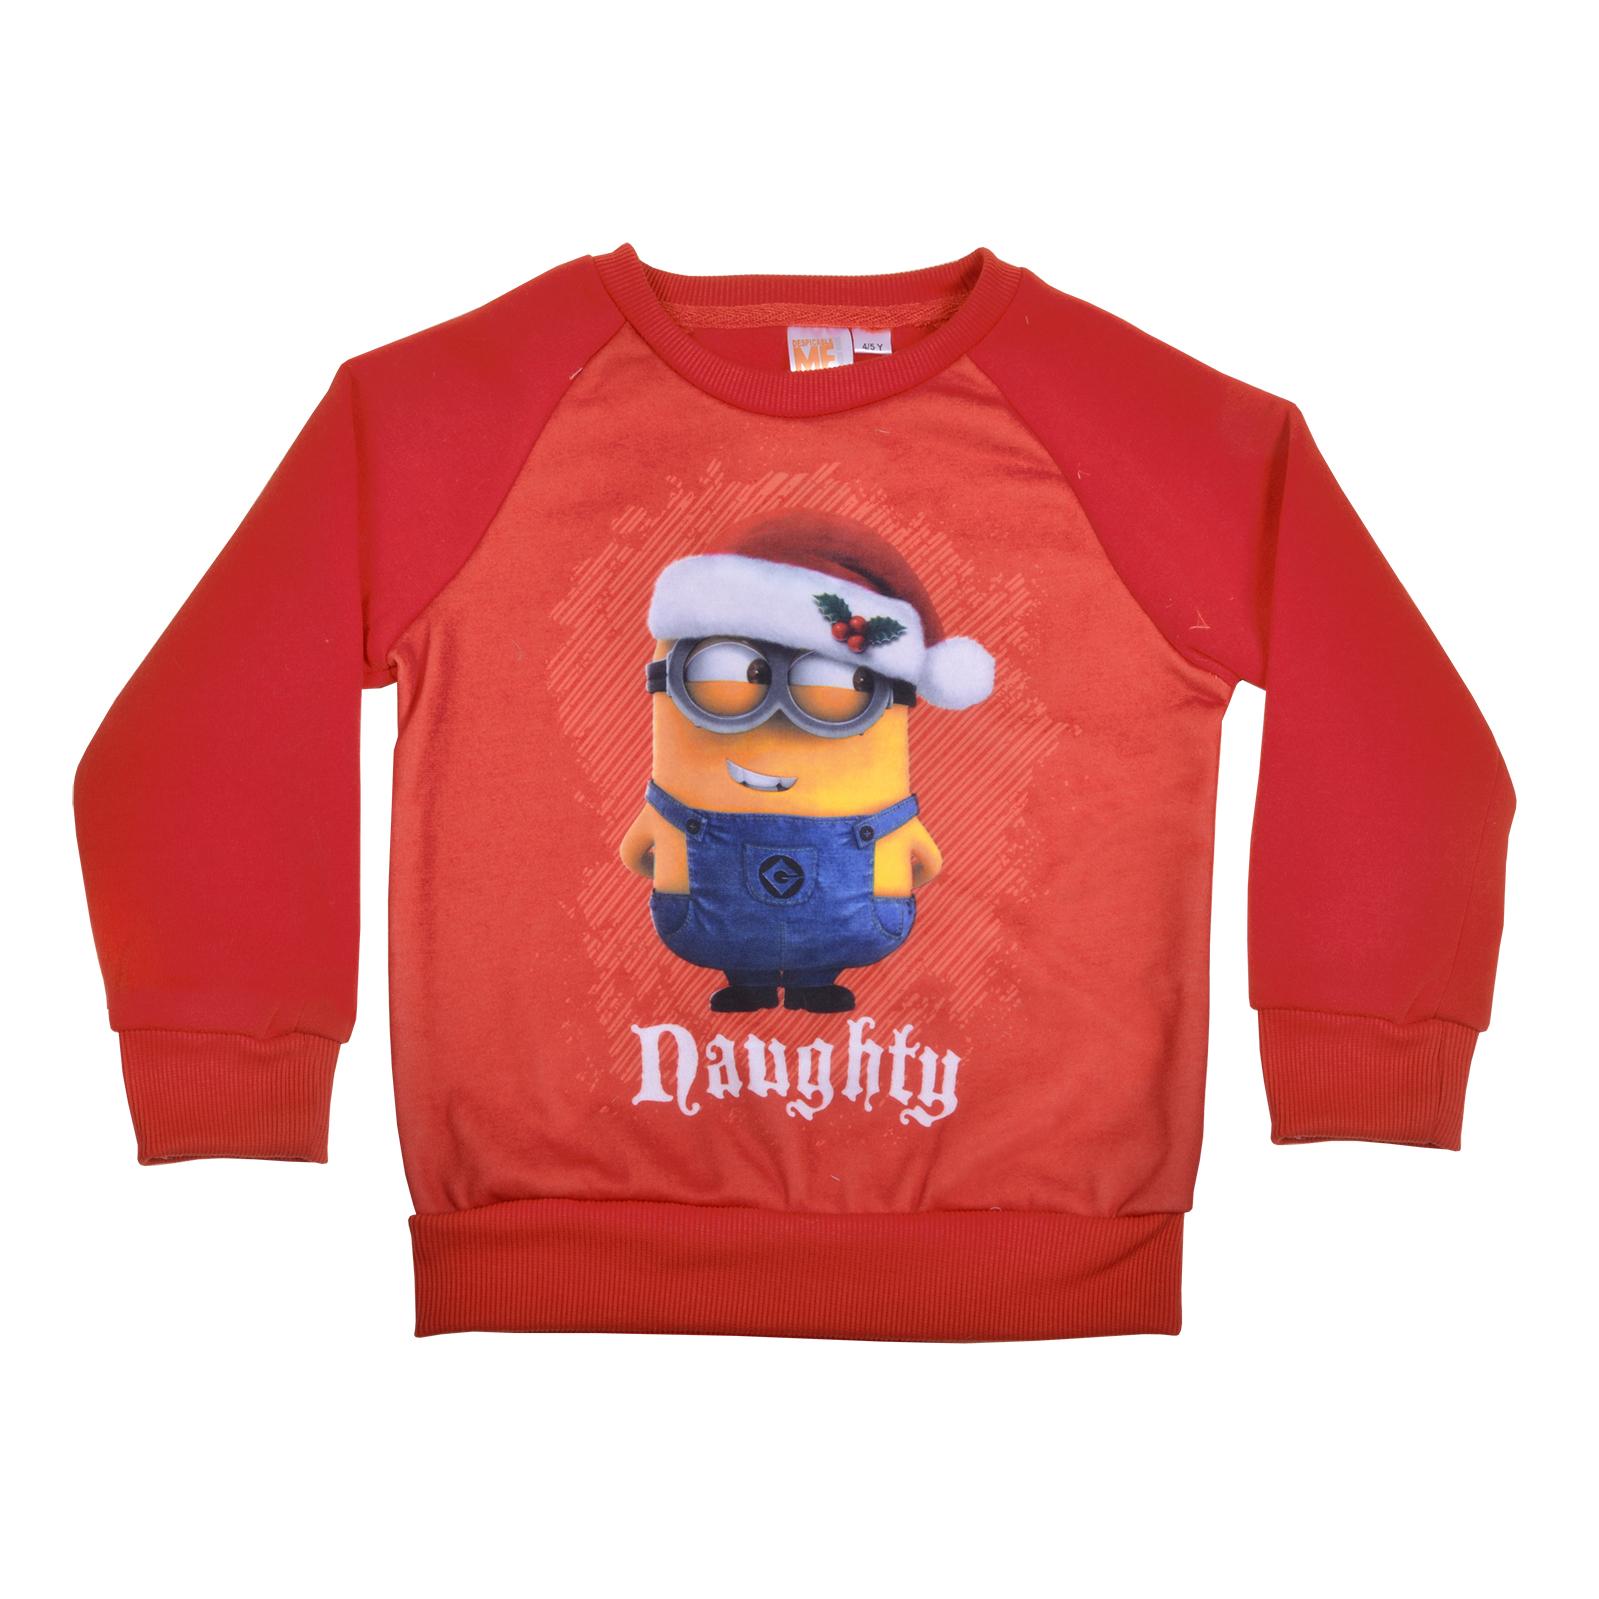 Childrens Christmas Jumper Xmas Sweatshirt Boys Girls Frozen ...